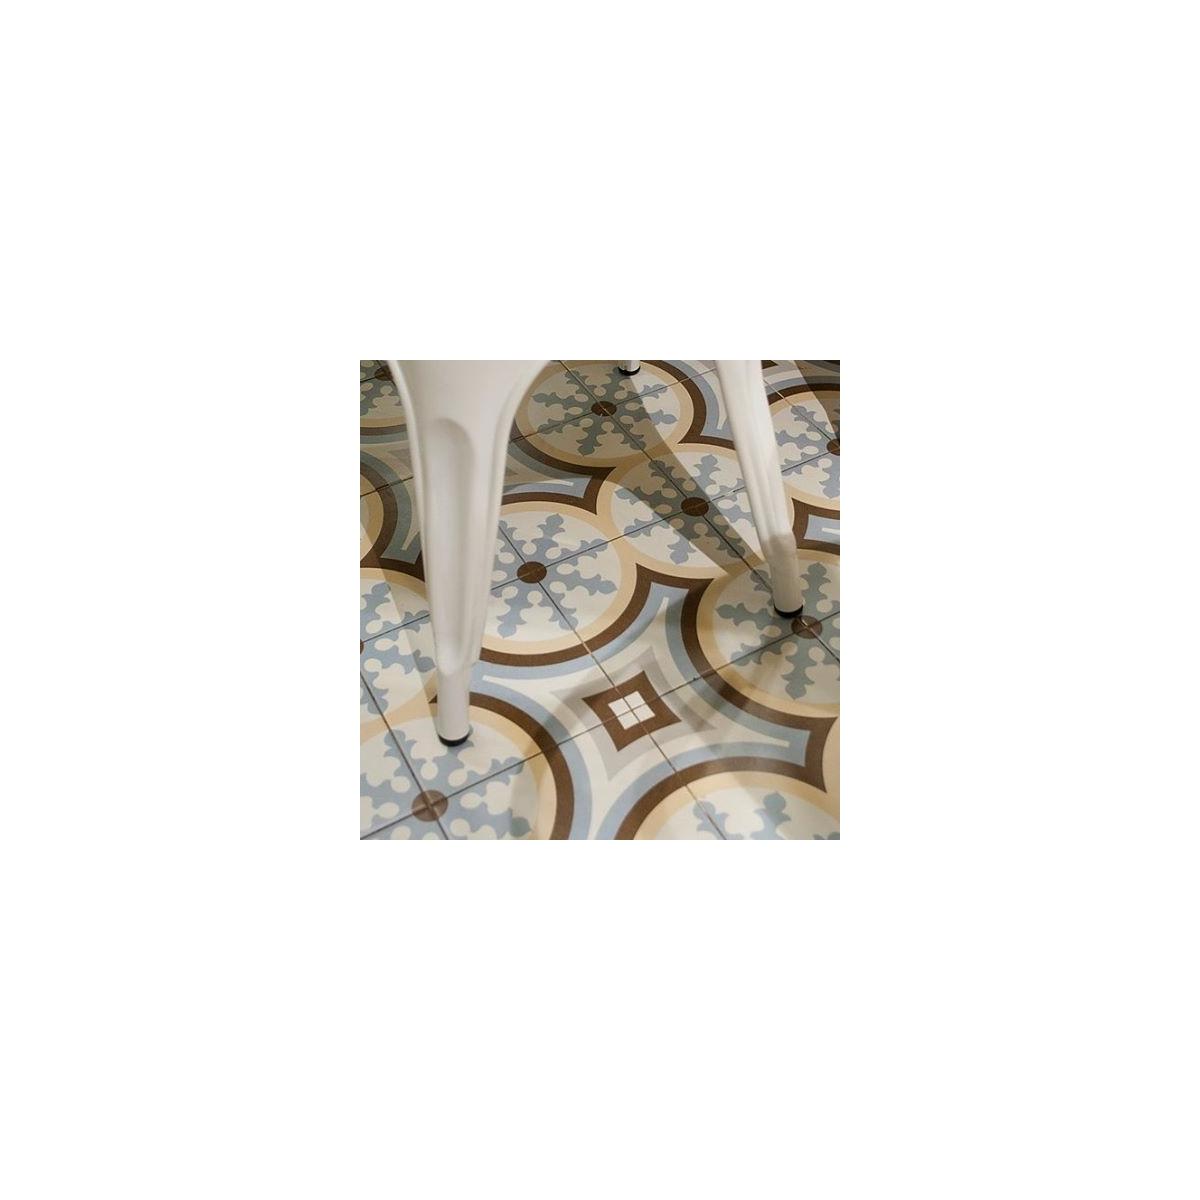 Beltri Celeste 20x20 (m2) Florentina celeste